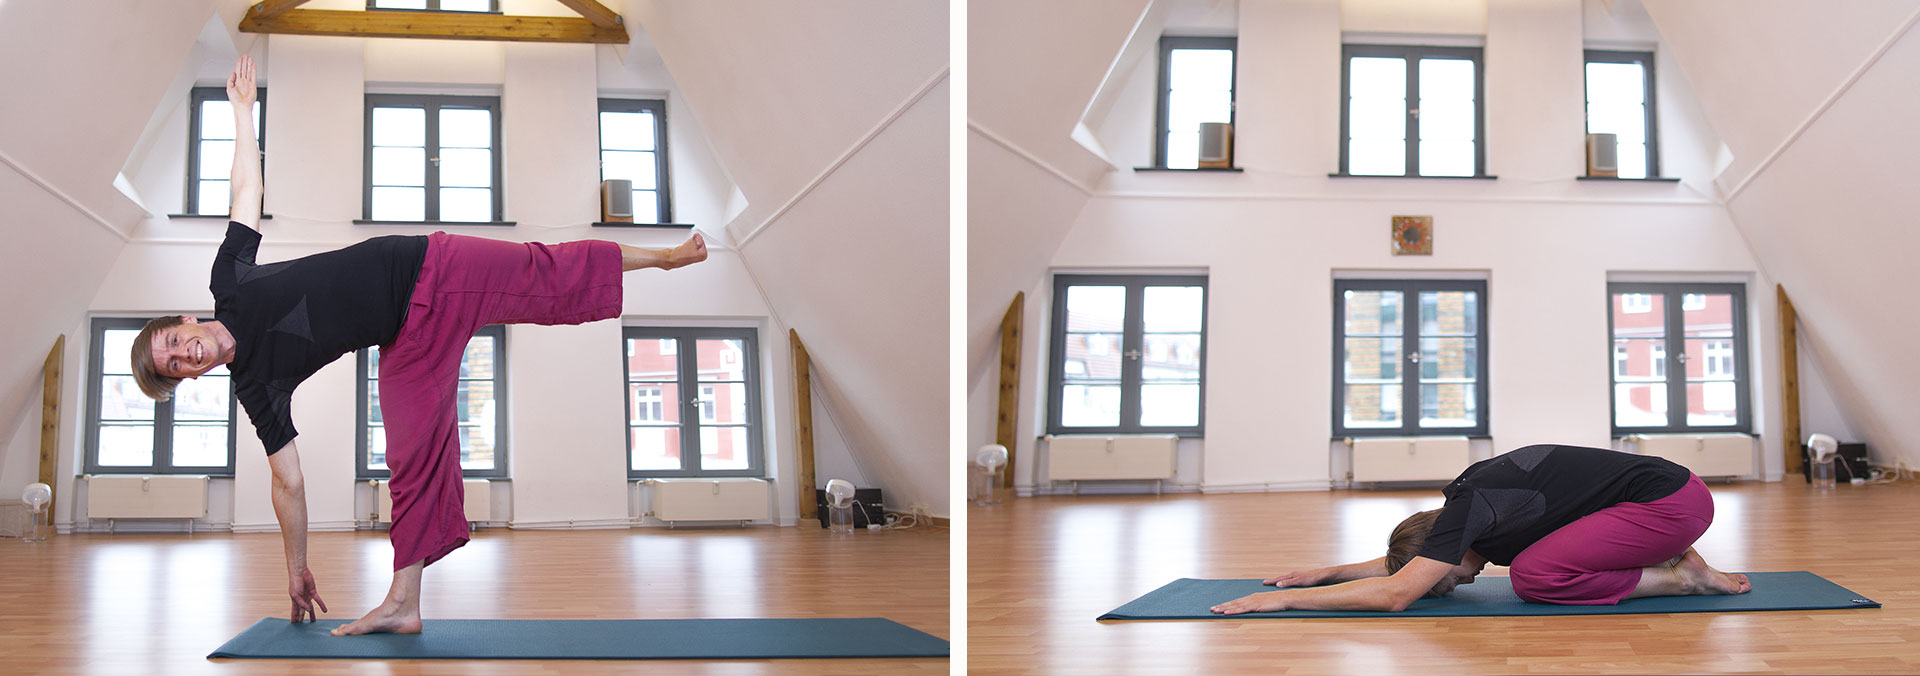 Hatha-Flow Yogaschule Christian Bender in Rostock